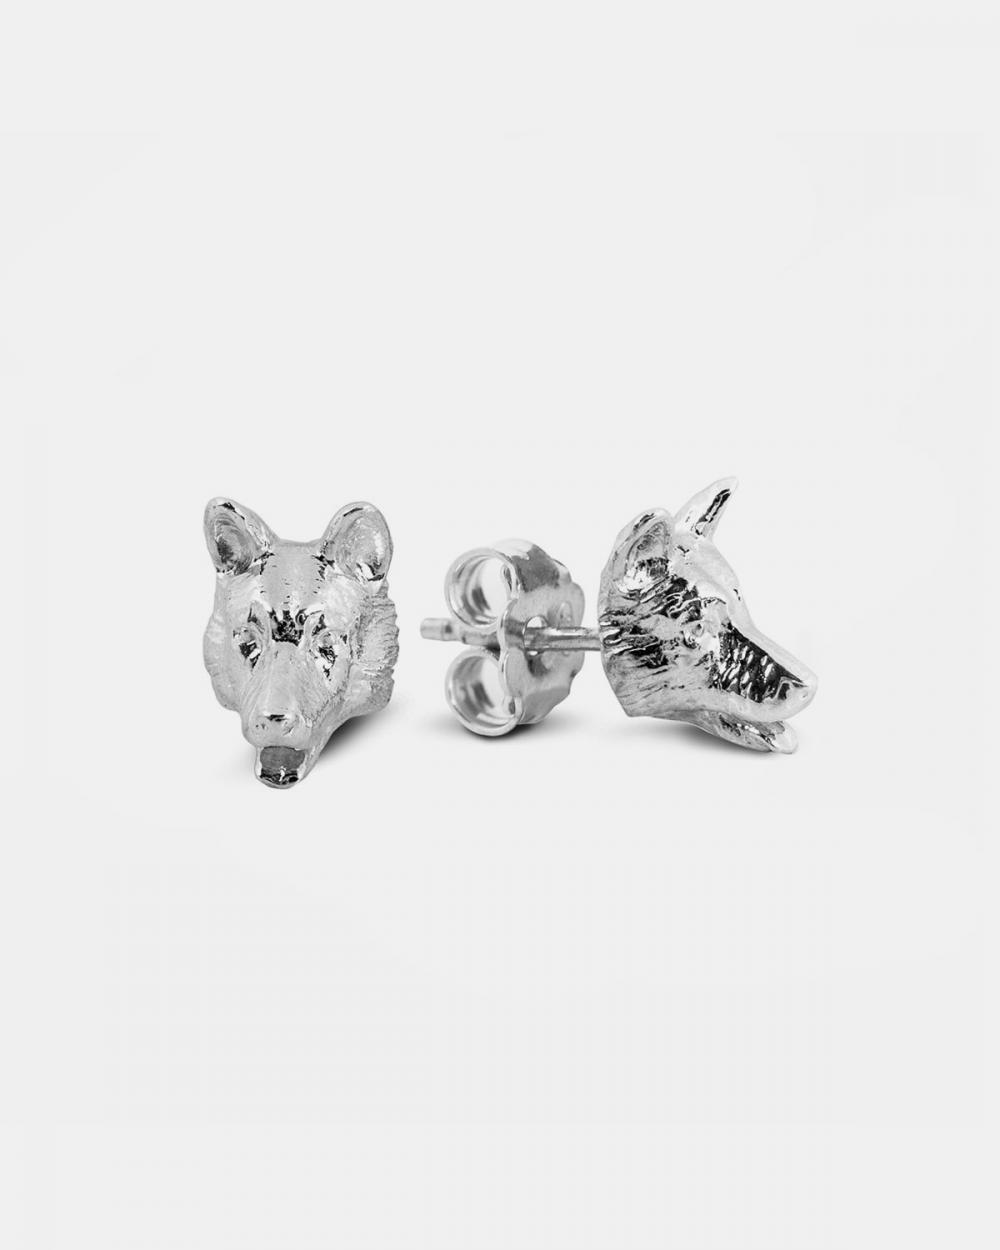 Earrings GERMAN SHEPERD COUPLE EARRINGS / POLISHED SILVER NOVE25